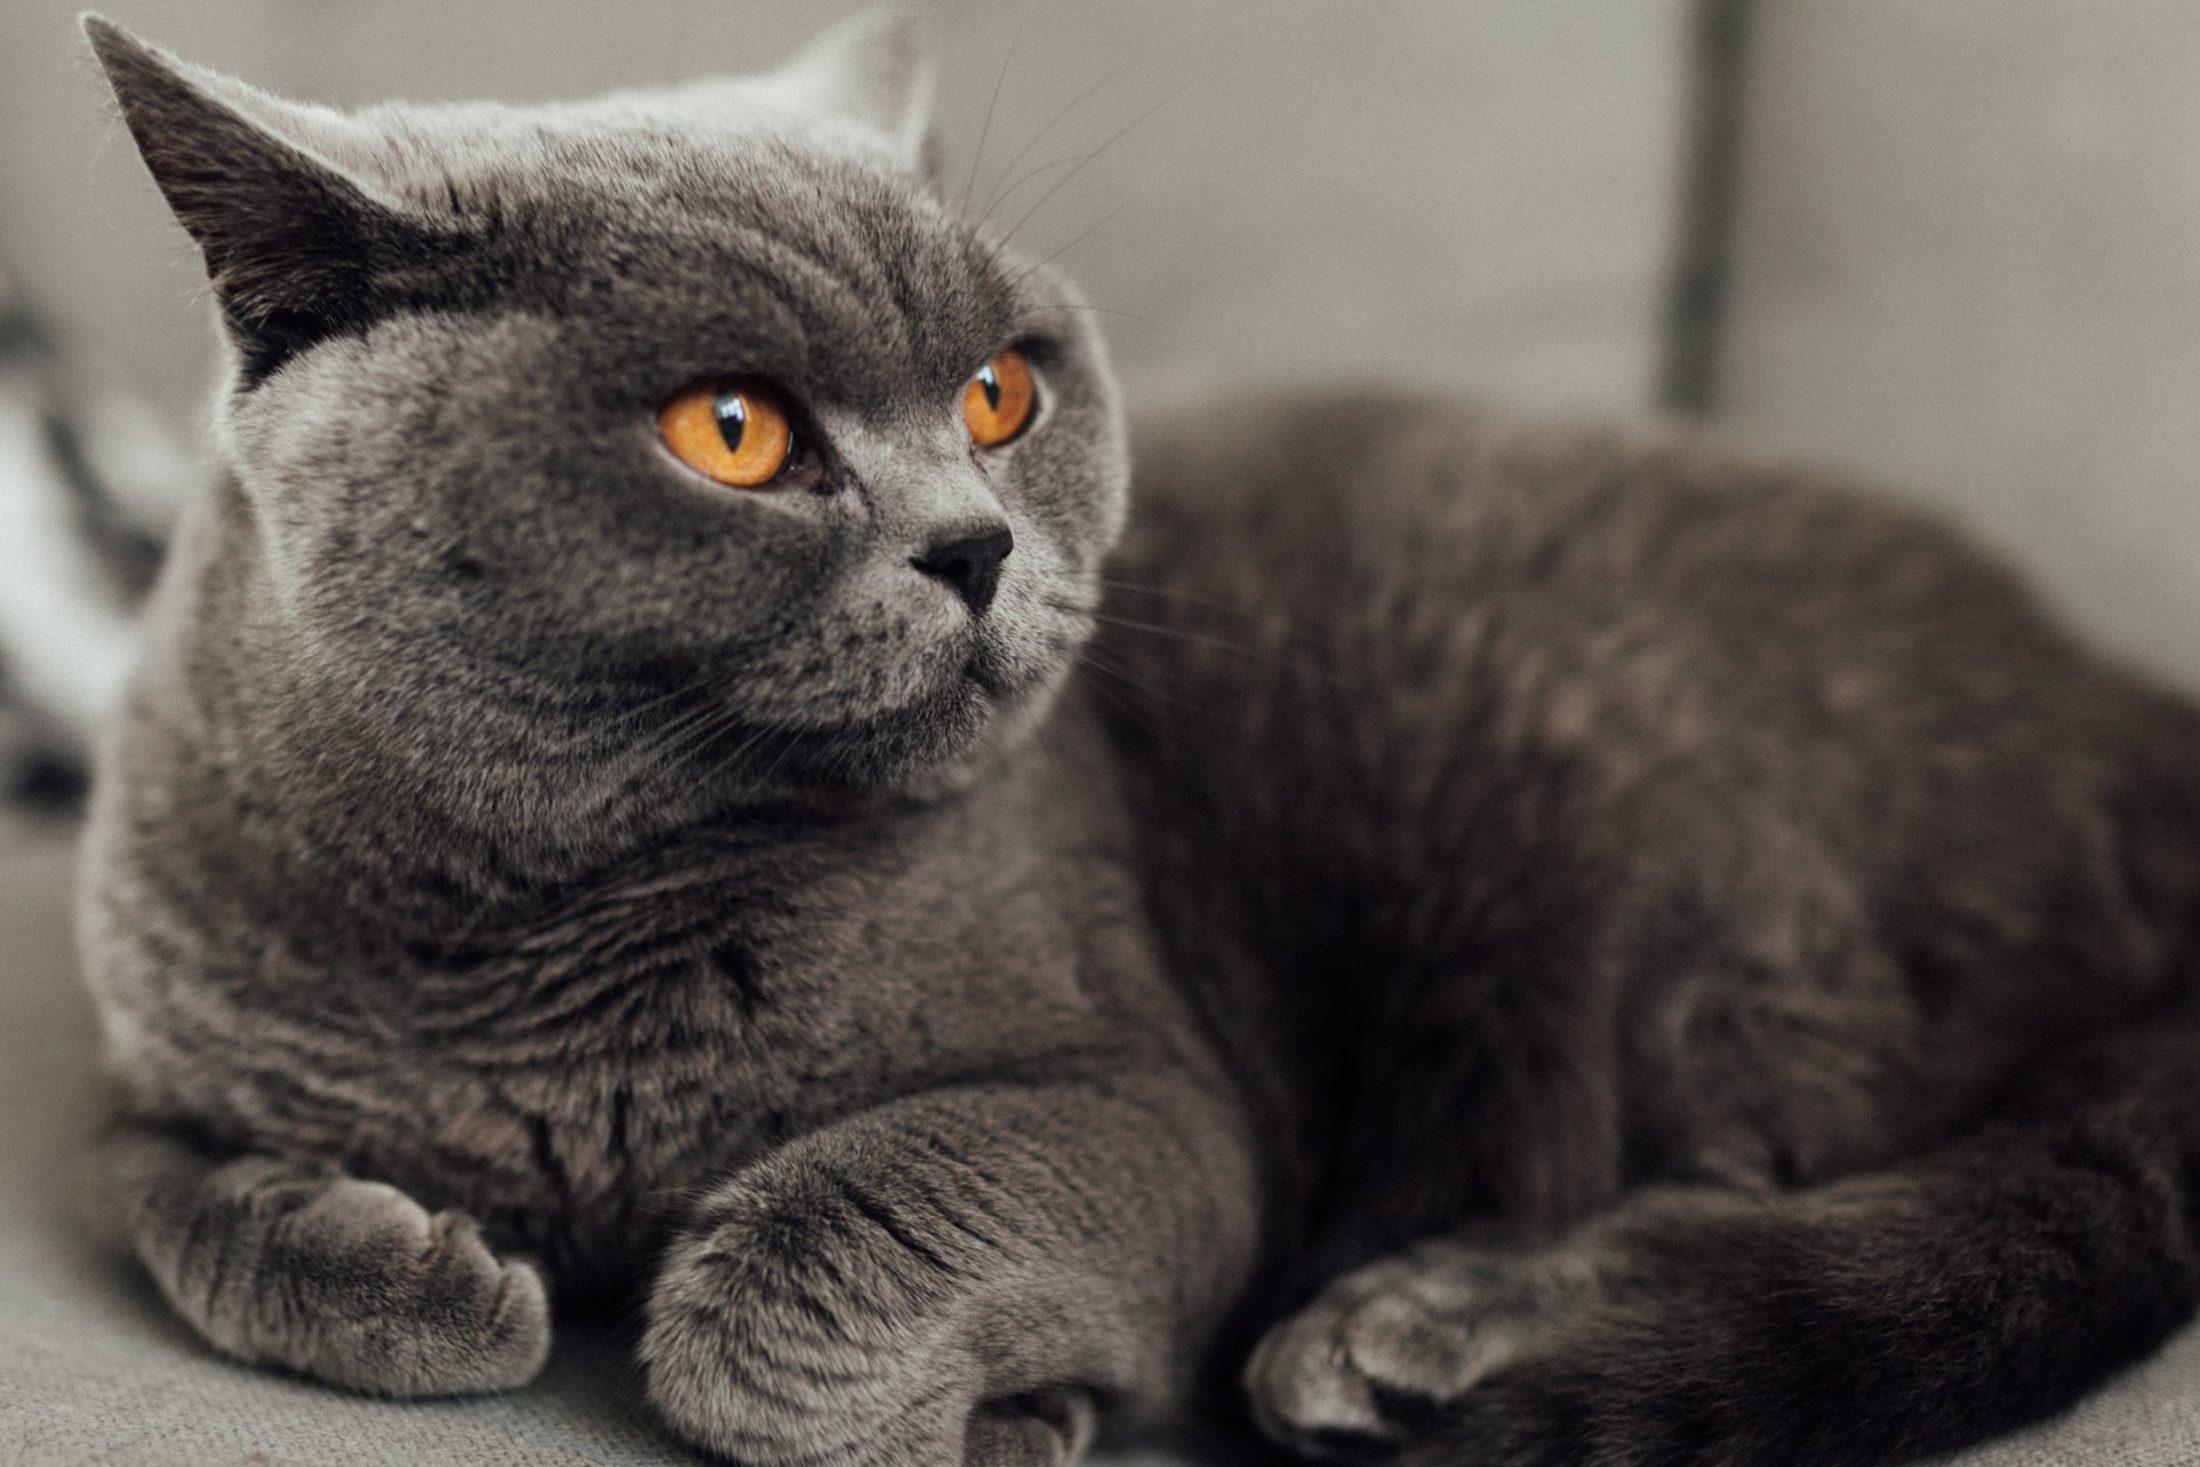 maiores racas de gatos - British Shorthair